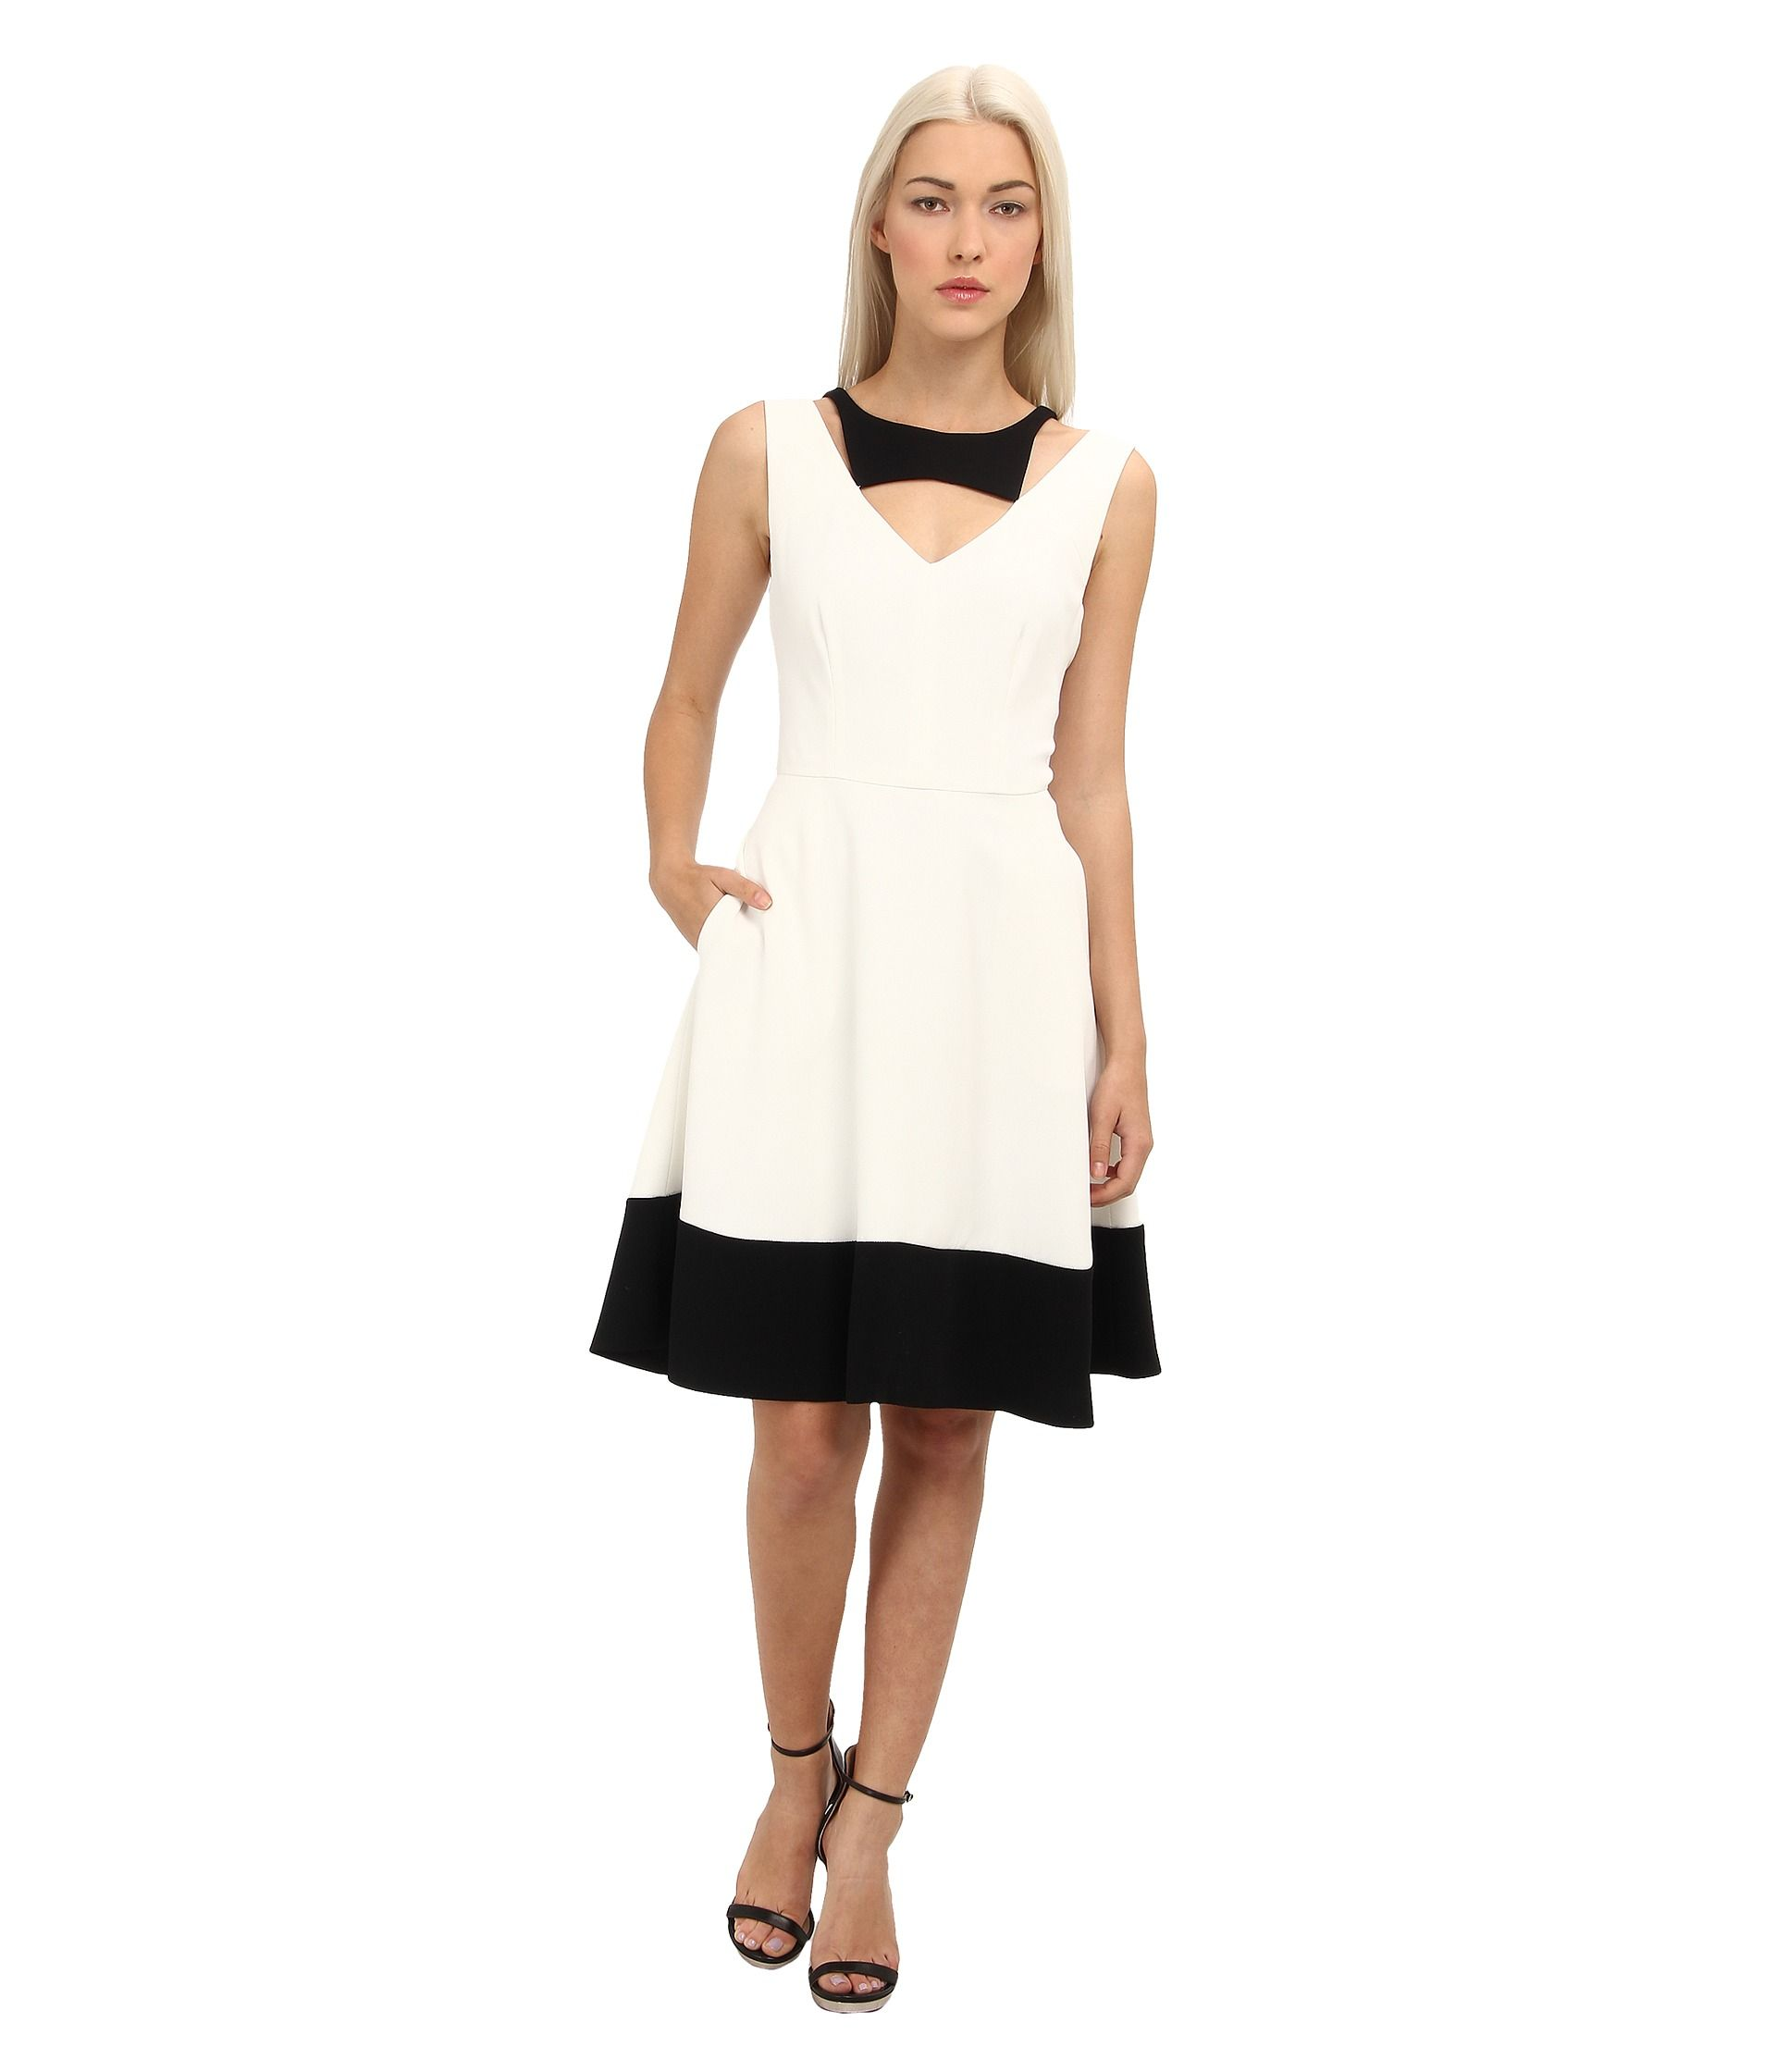 Rachel Roy Color Block Dress White/Black - Zappos.com Free Shipping BOTH Ways